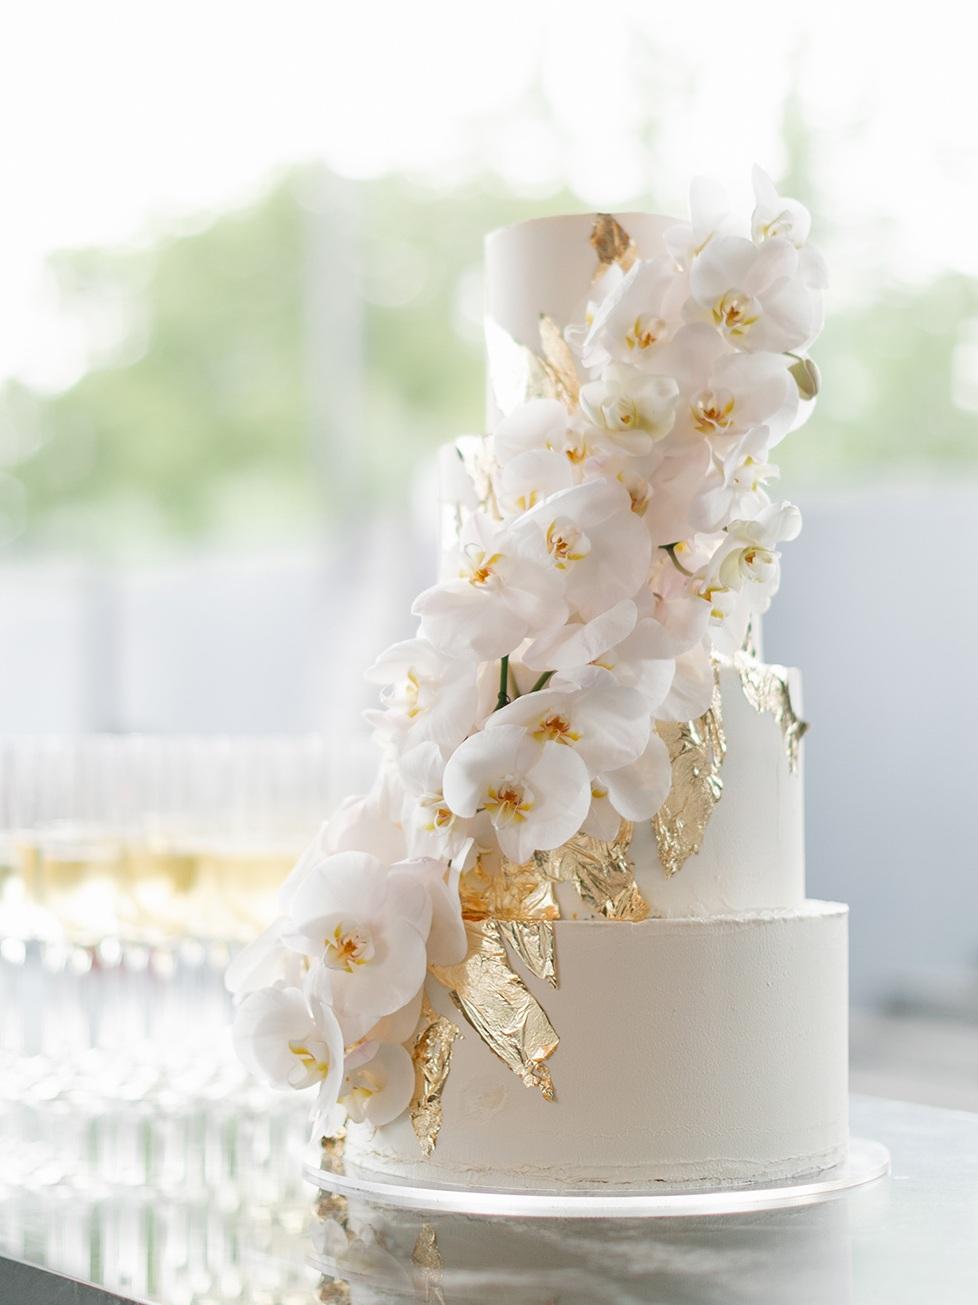 White+Wedding+Cake+%7C+Kelly+Jayne